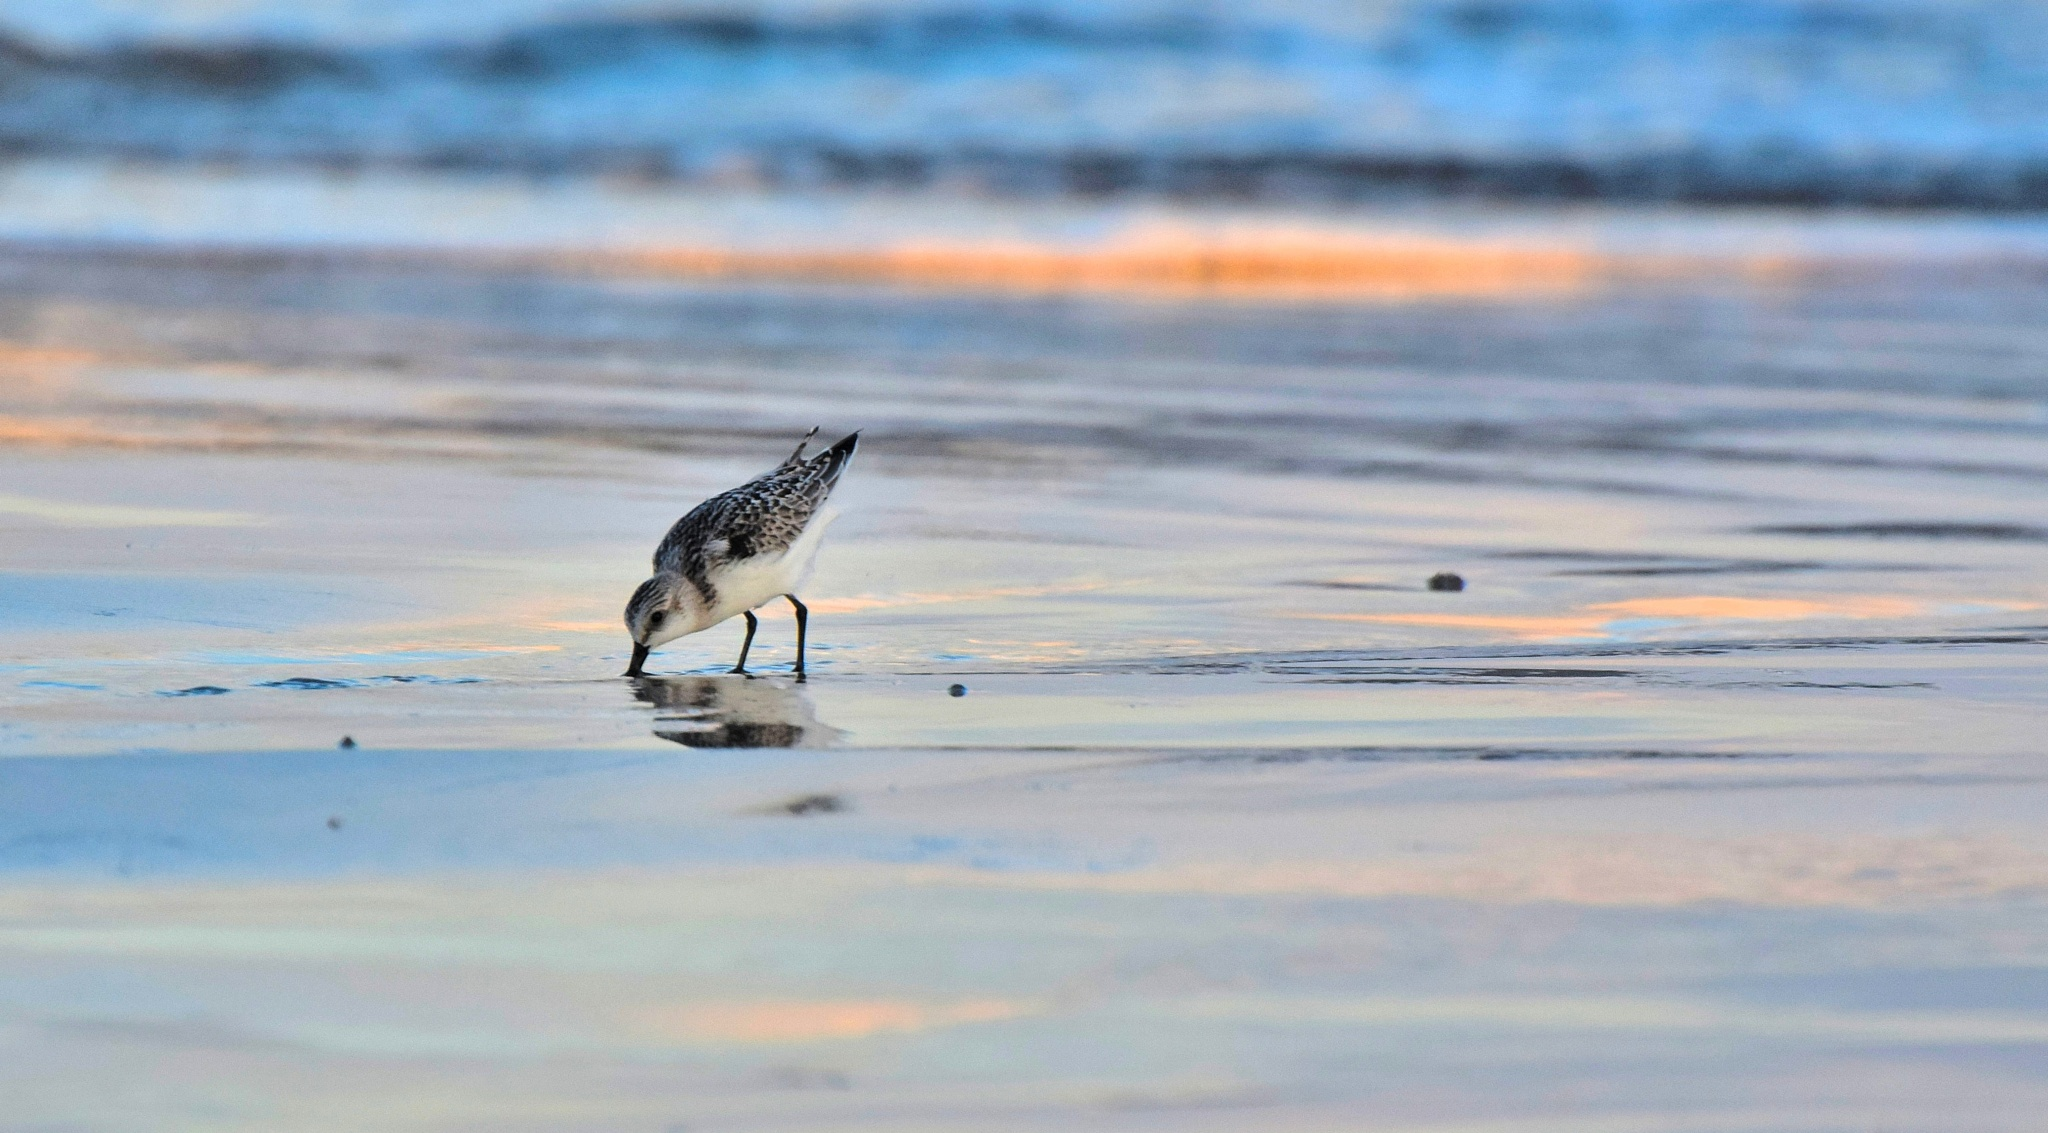 Galveston Birds 80 by Lawrence Scott Hess